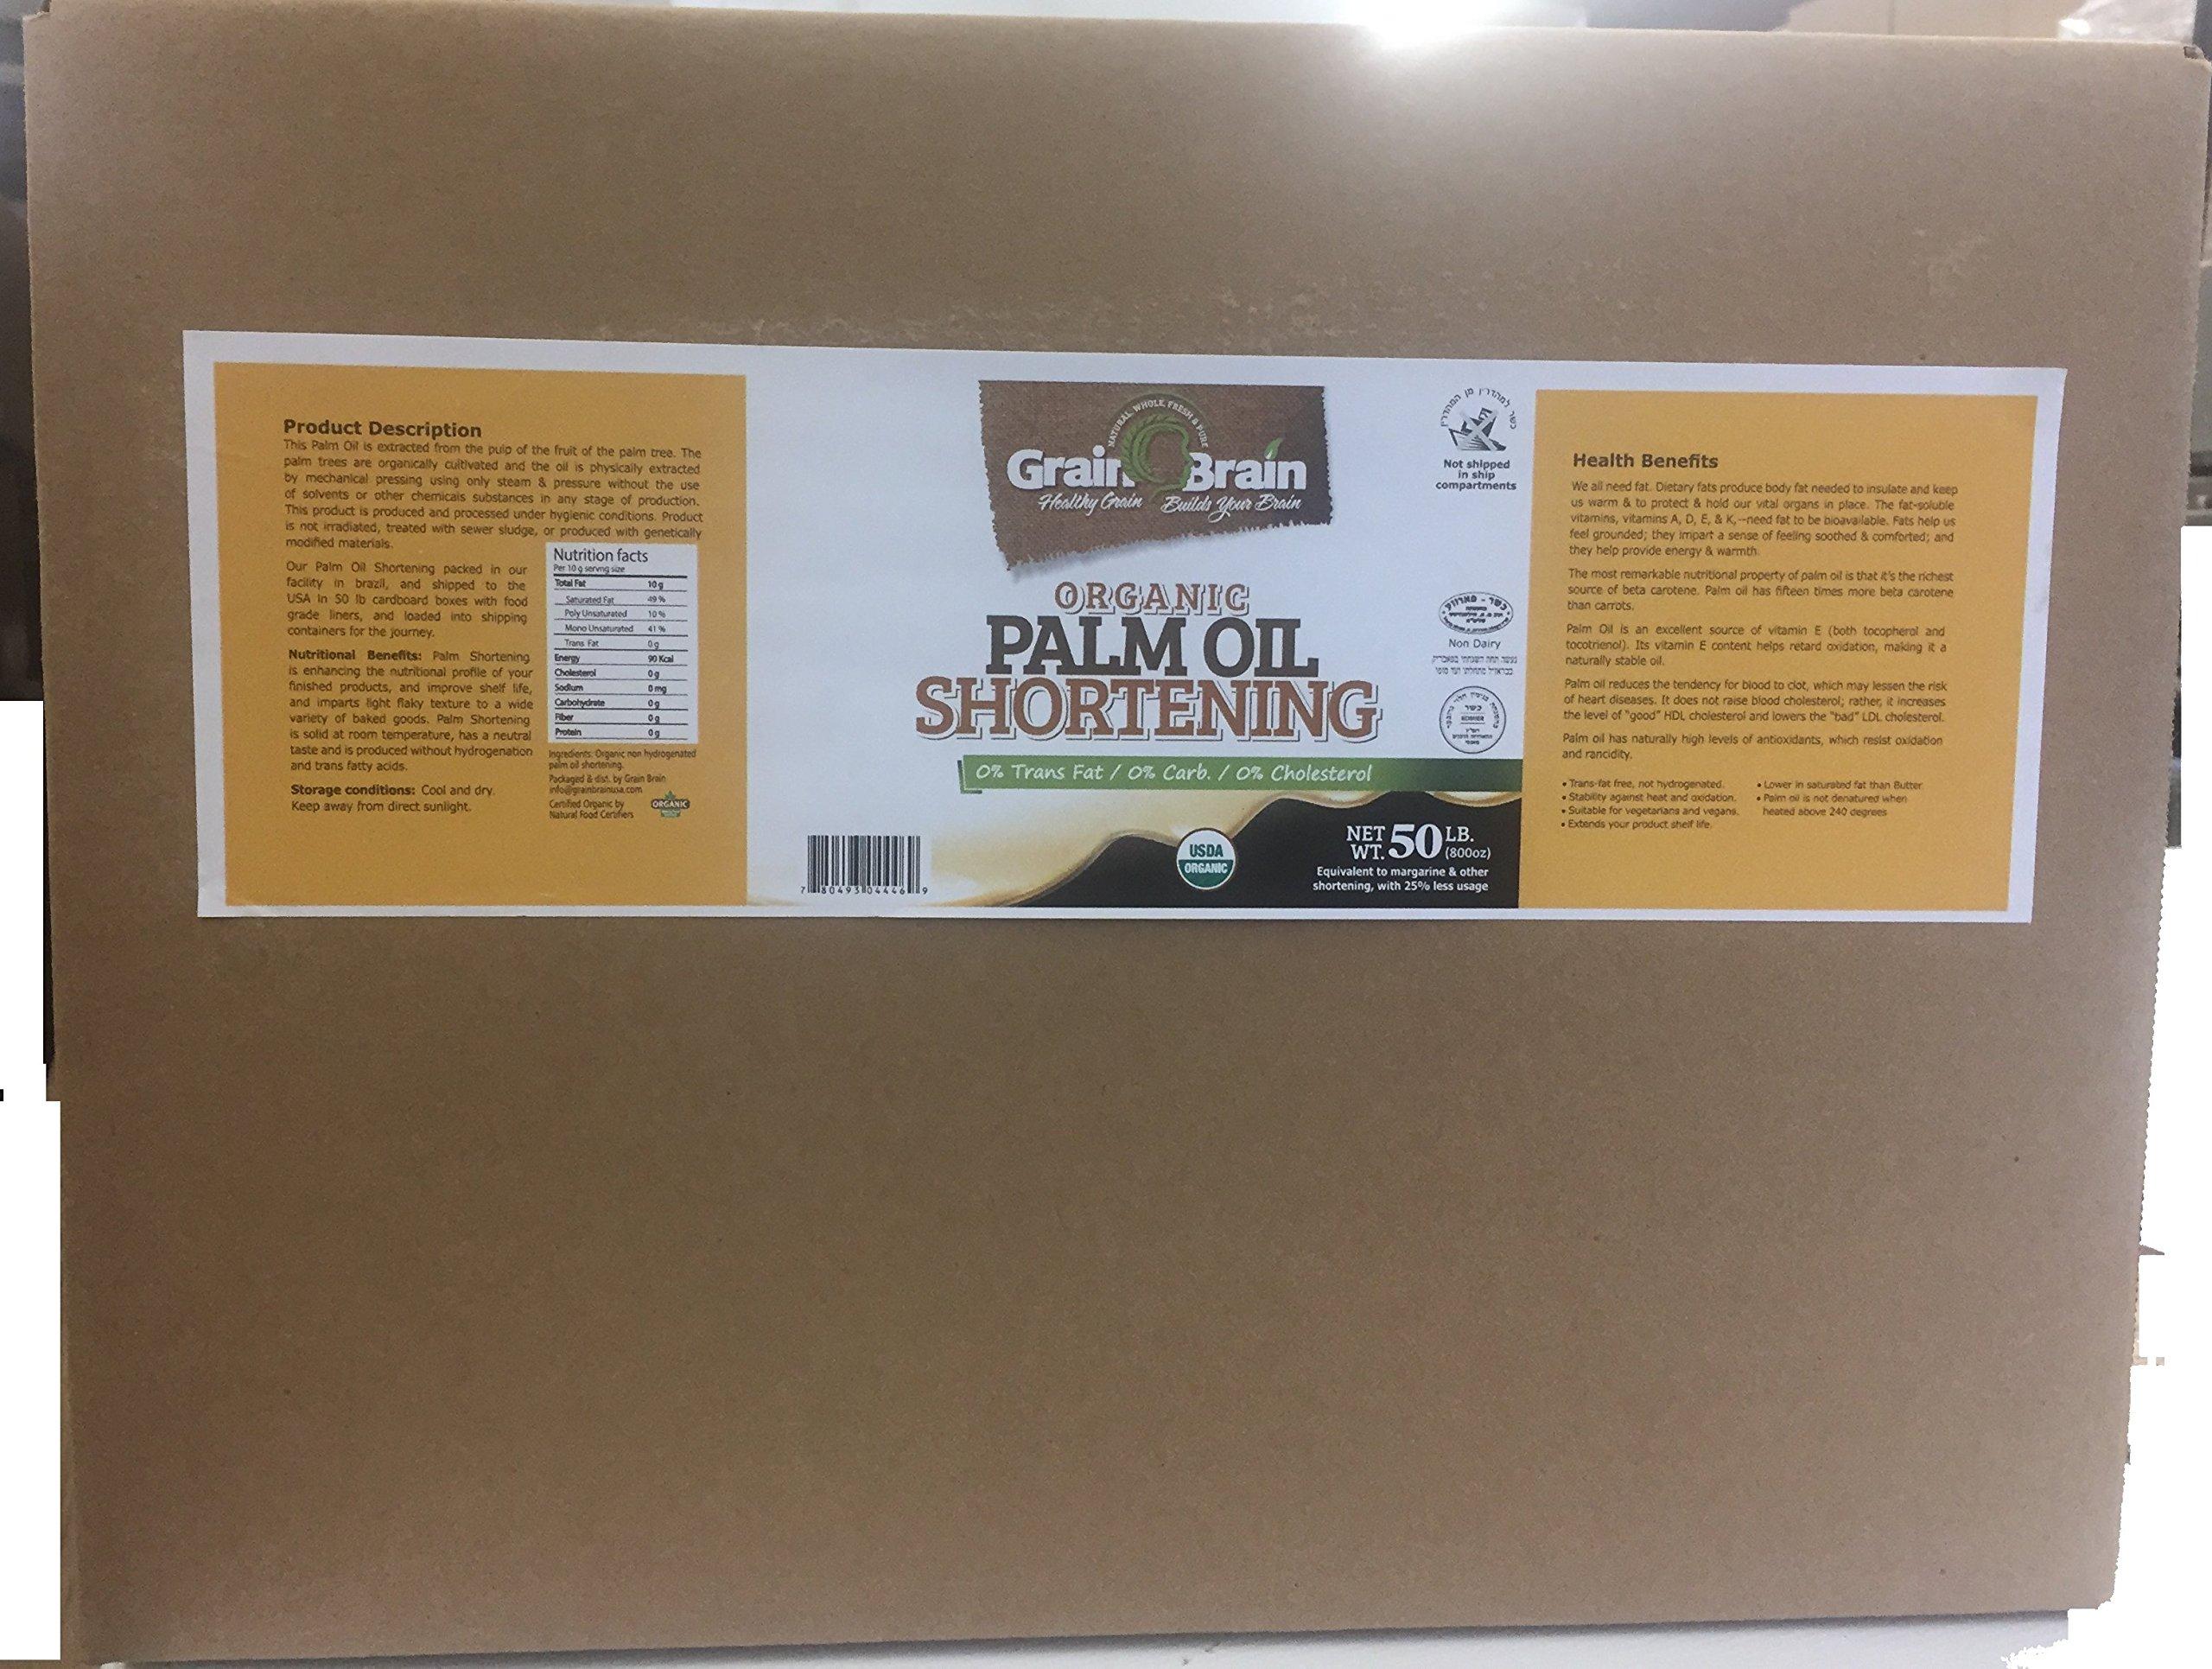 Grain Brain Organic Palm Shortening (50 lb) by GRAIN BRAIN (Image #1)